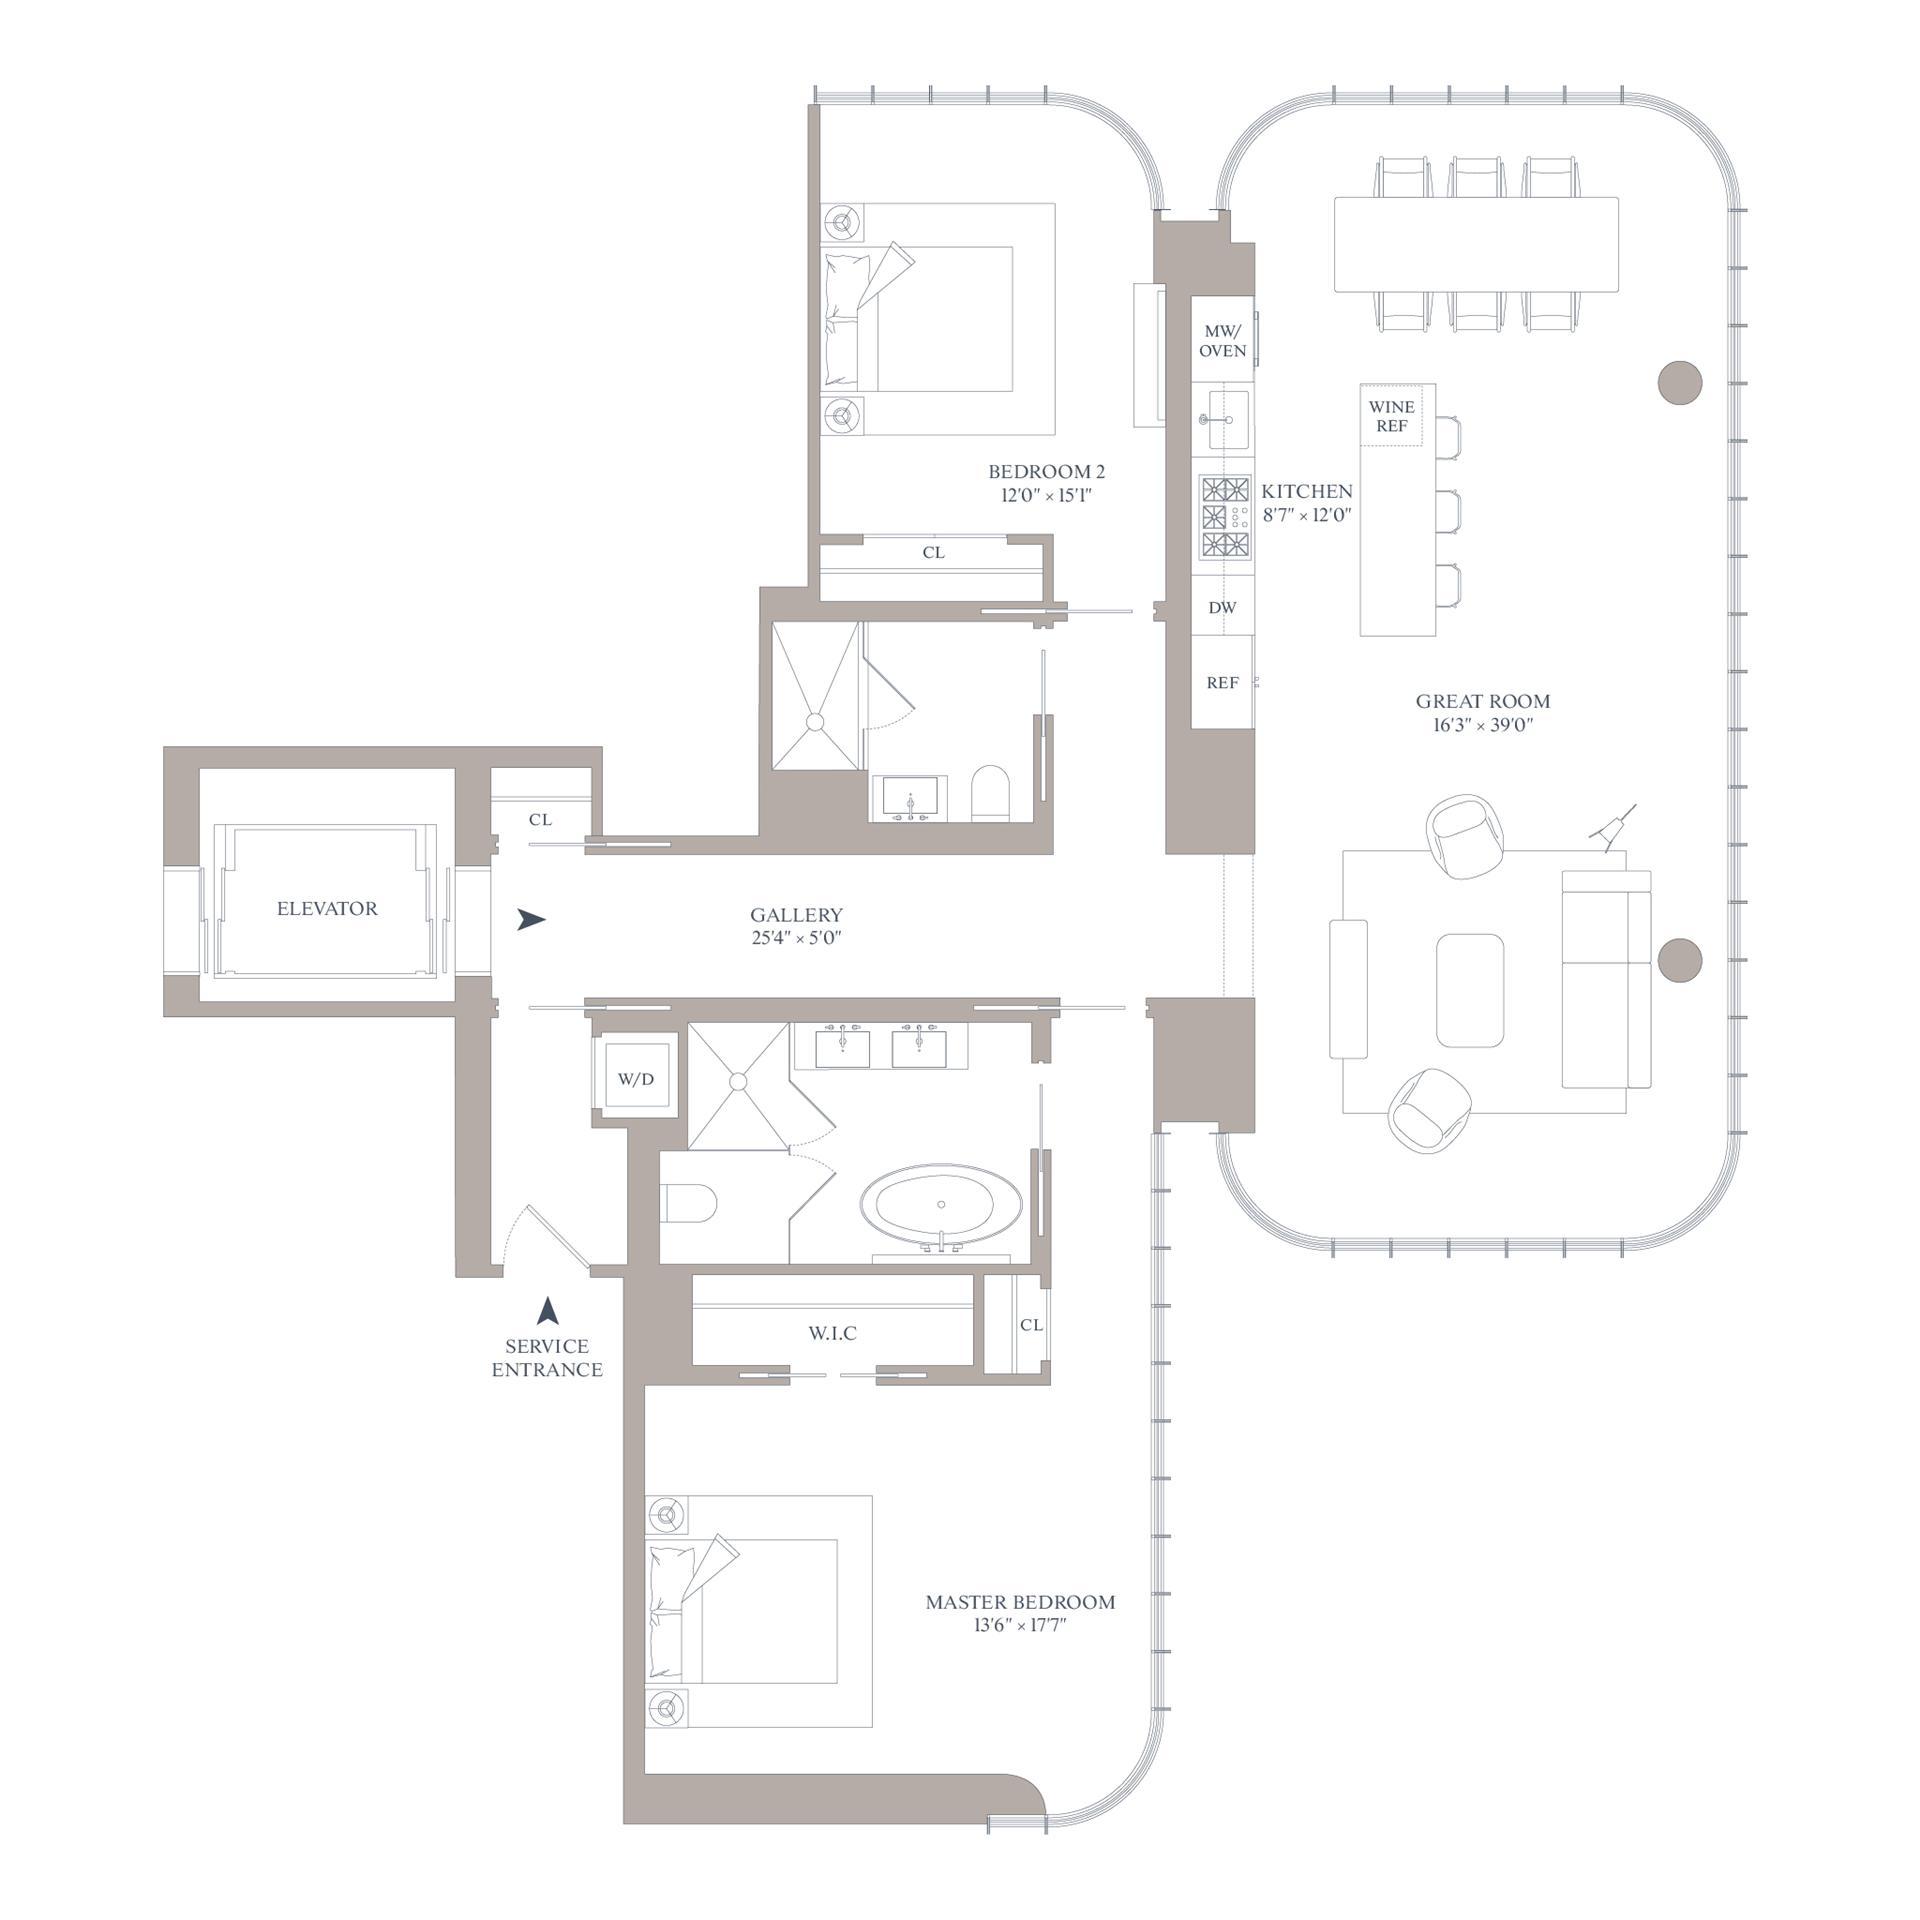 Floor plan of 565 Broome St, N24B - SoHo - Nolita, New York